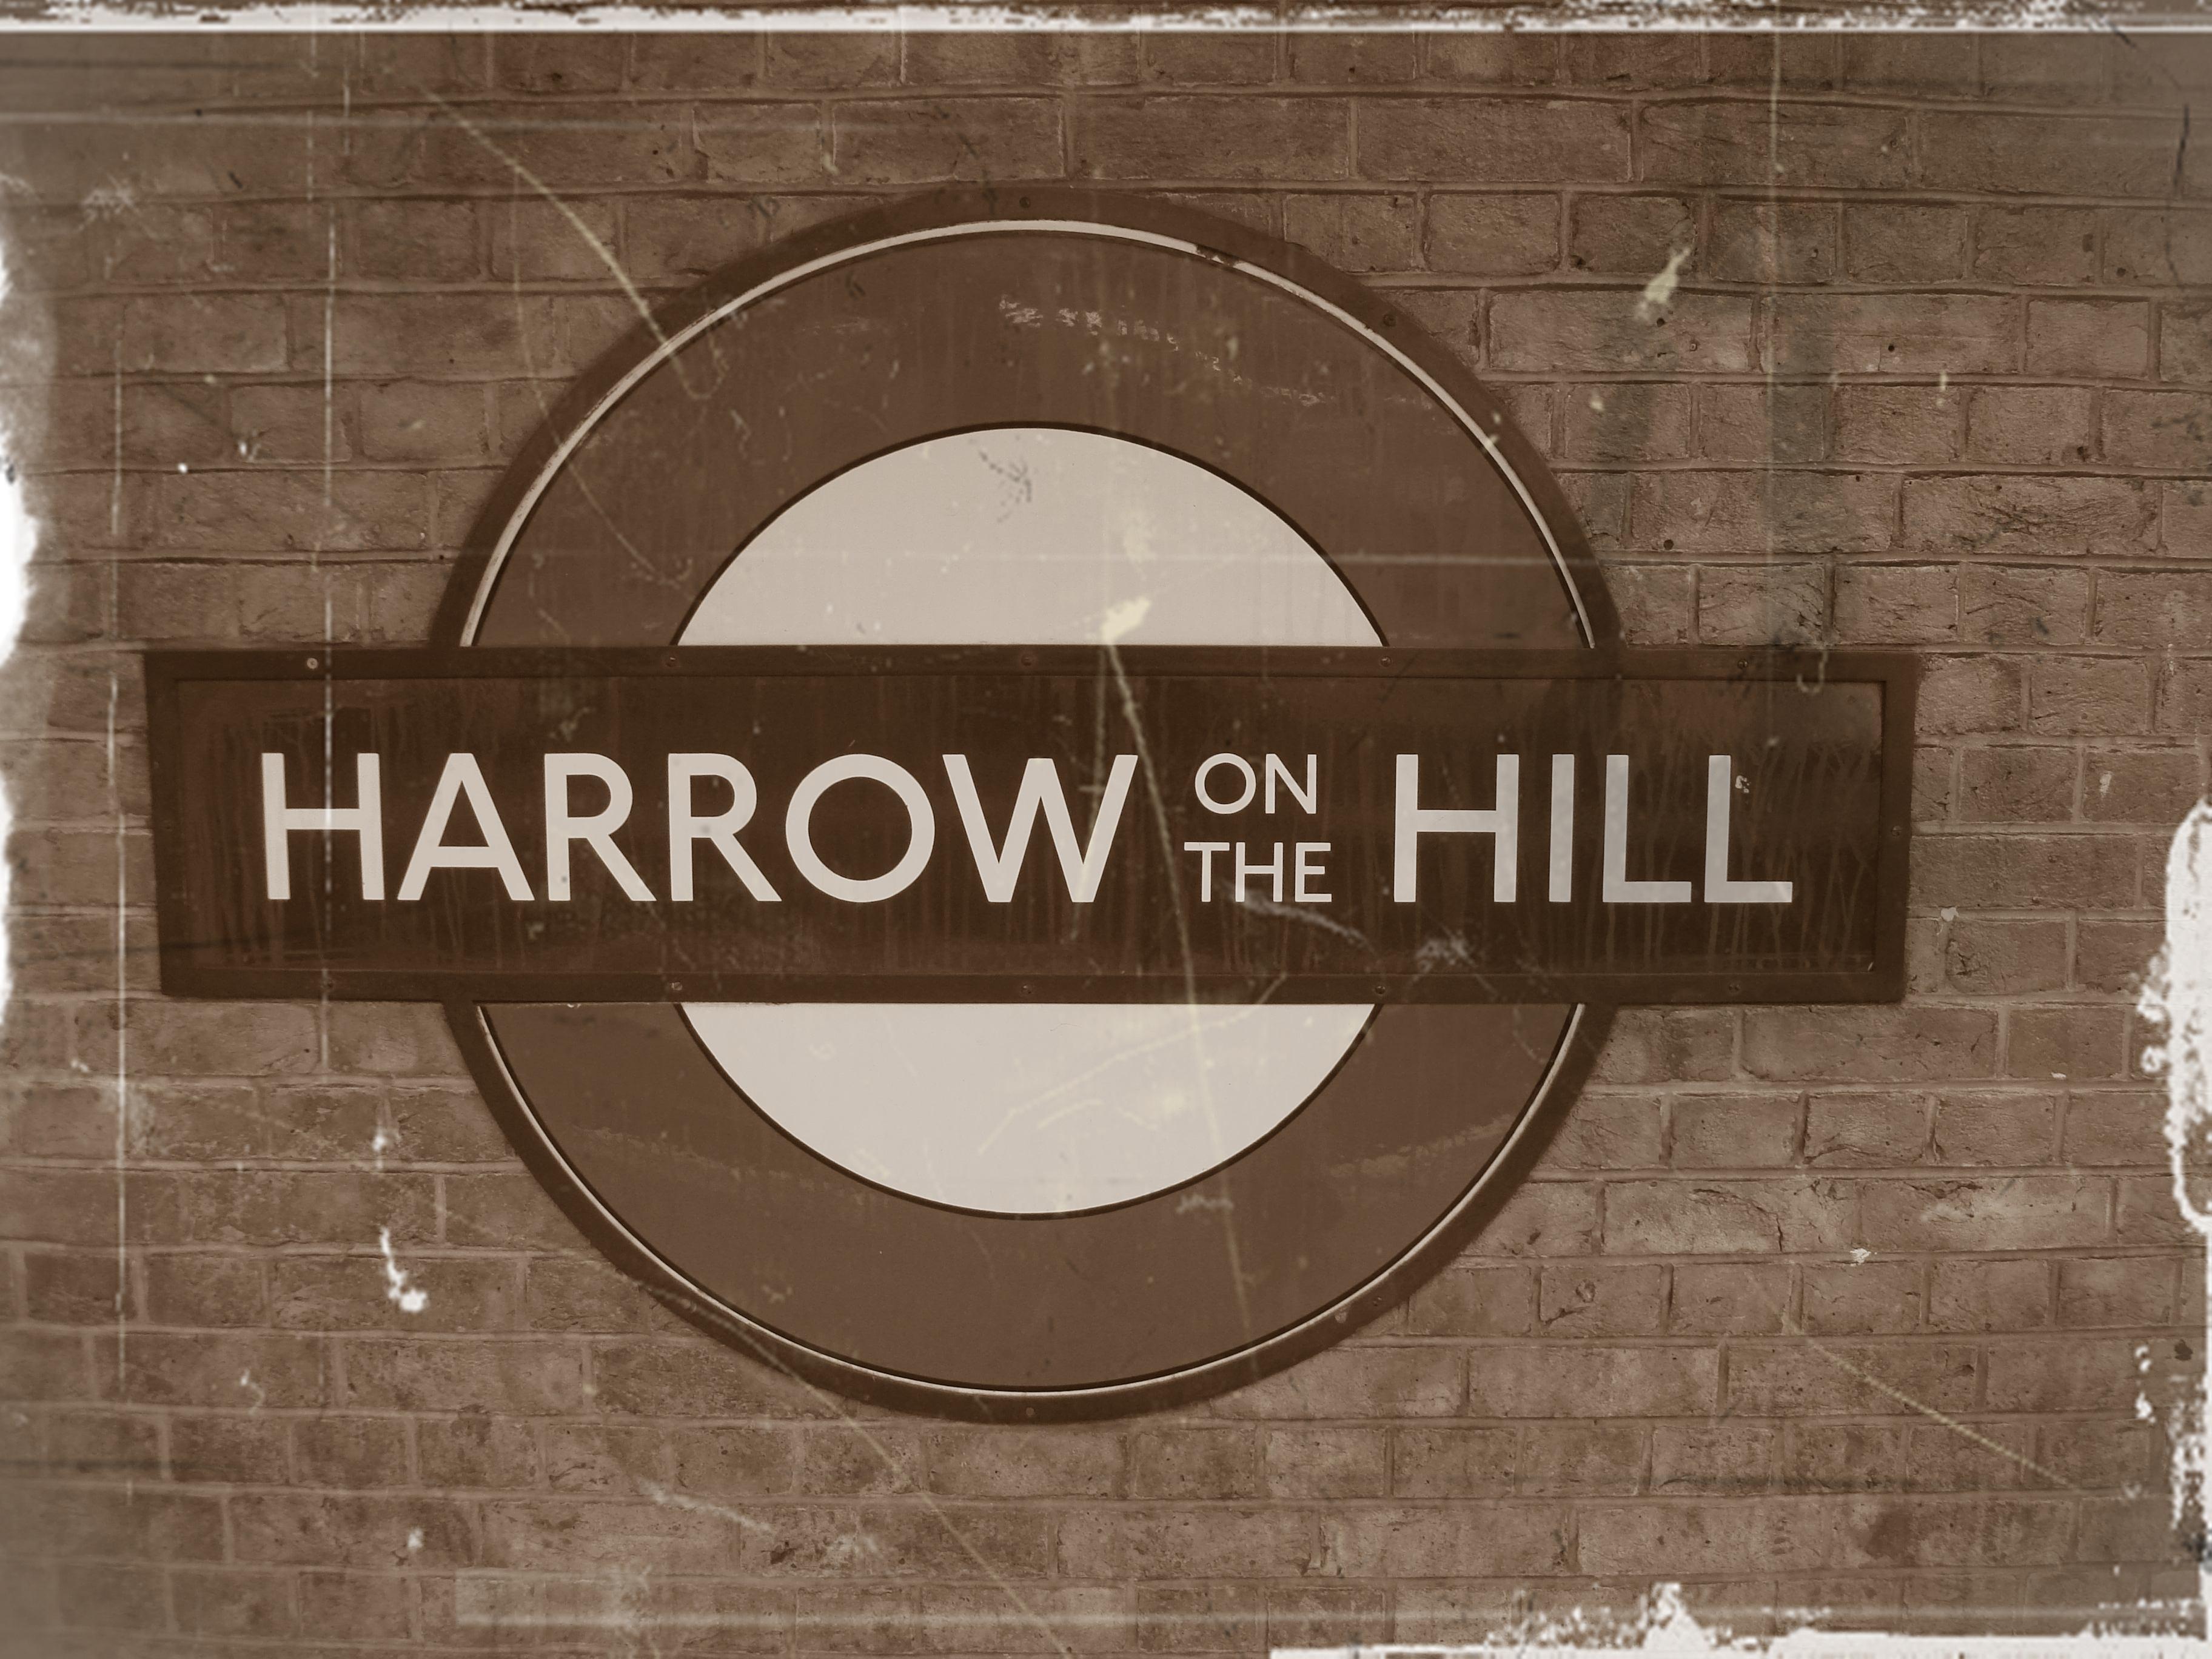 Harrow-on-the-Hill-Tube-Station